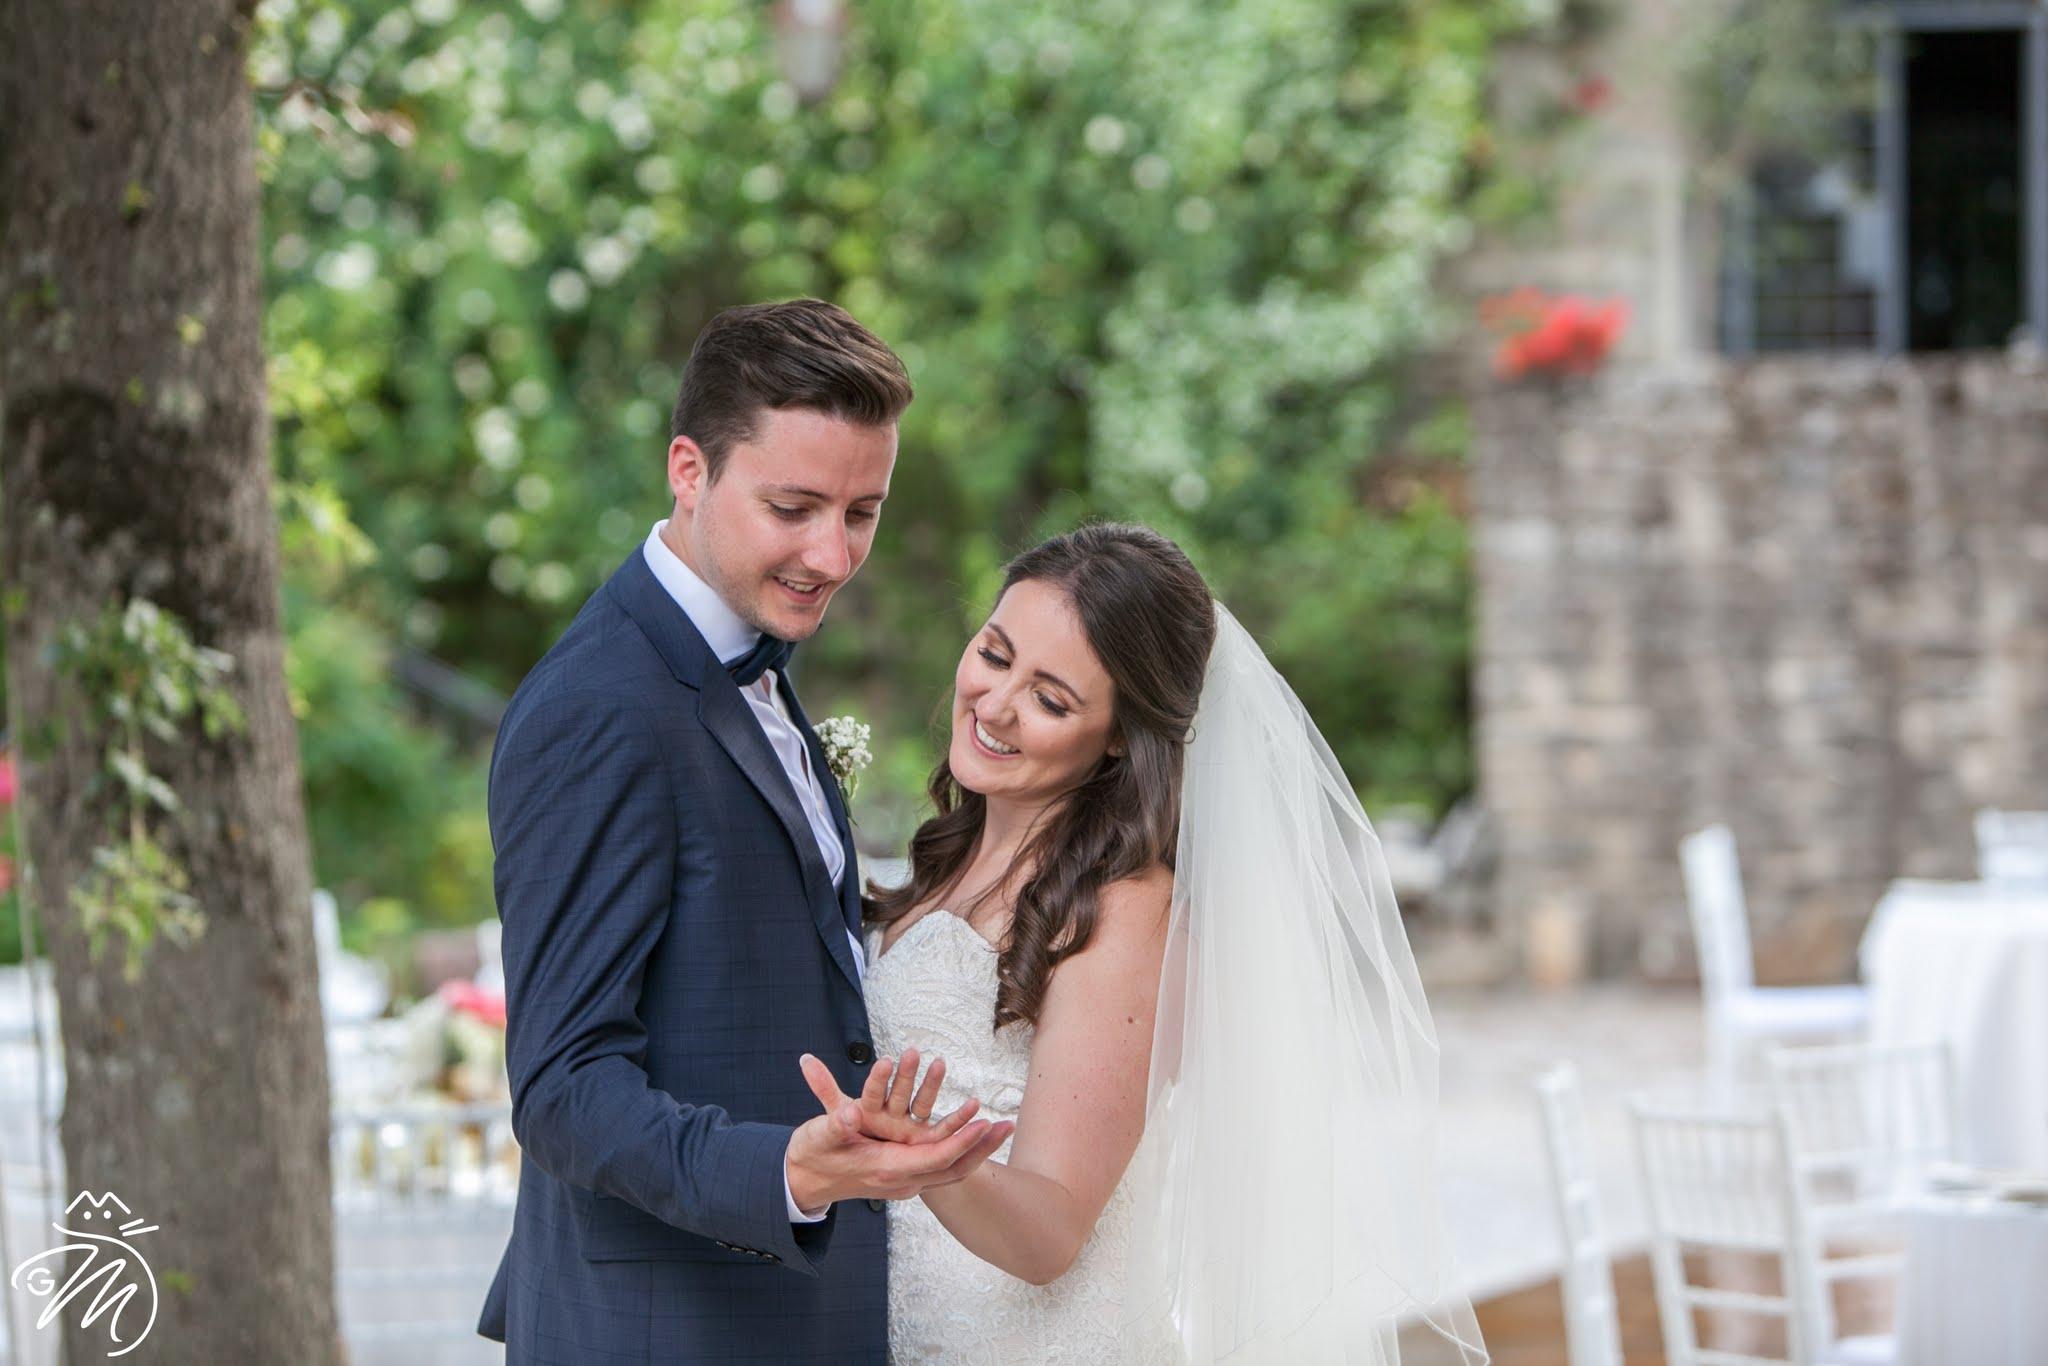 fotografo matrimonio Roma photographer in Italy ORIZZONTALI2_LOGO_HOME_PAGE_INTERNATIONAL_PHOTOGRAPHER_IN_ROME_WEDDING_DESTINATION_GIROLAMO_MONTELEONE_-14